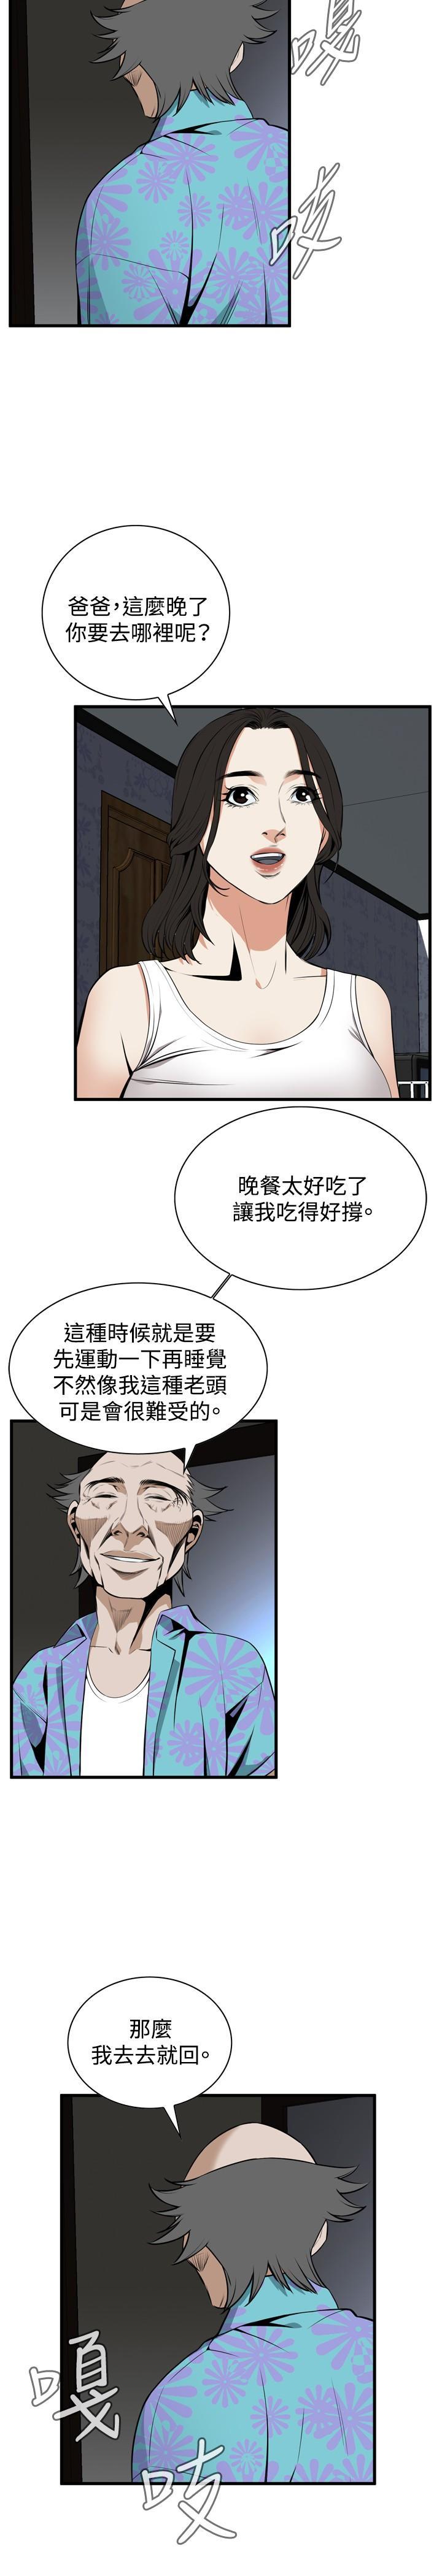 Take a Peek 偷窥 Ch.39~60 [Chinese]中文 141